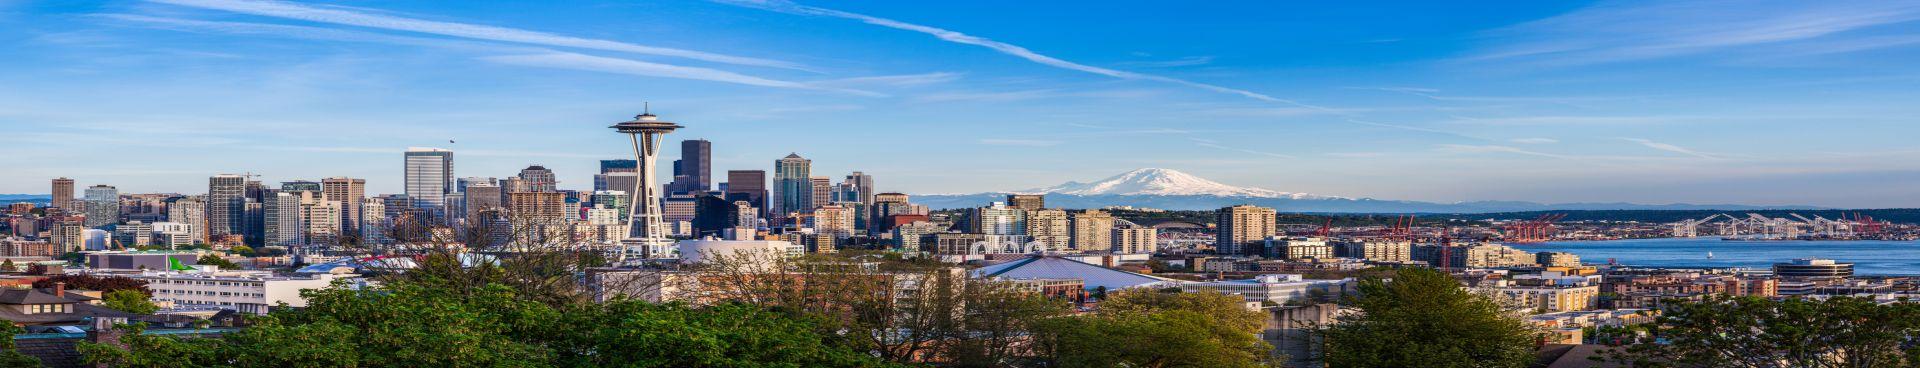 Seattle resized